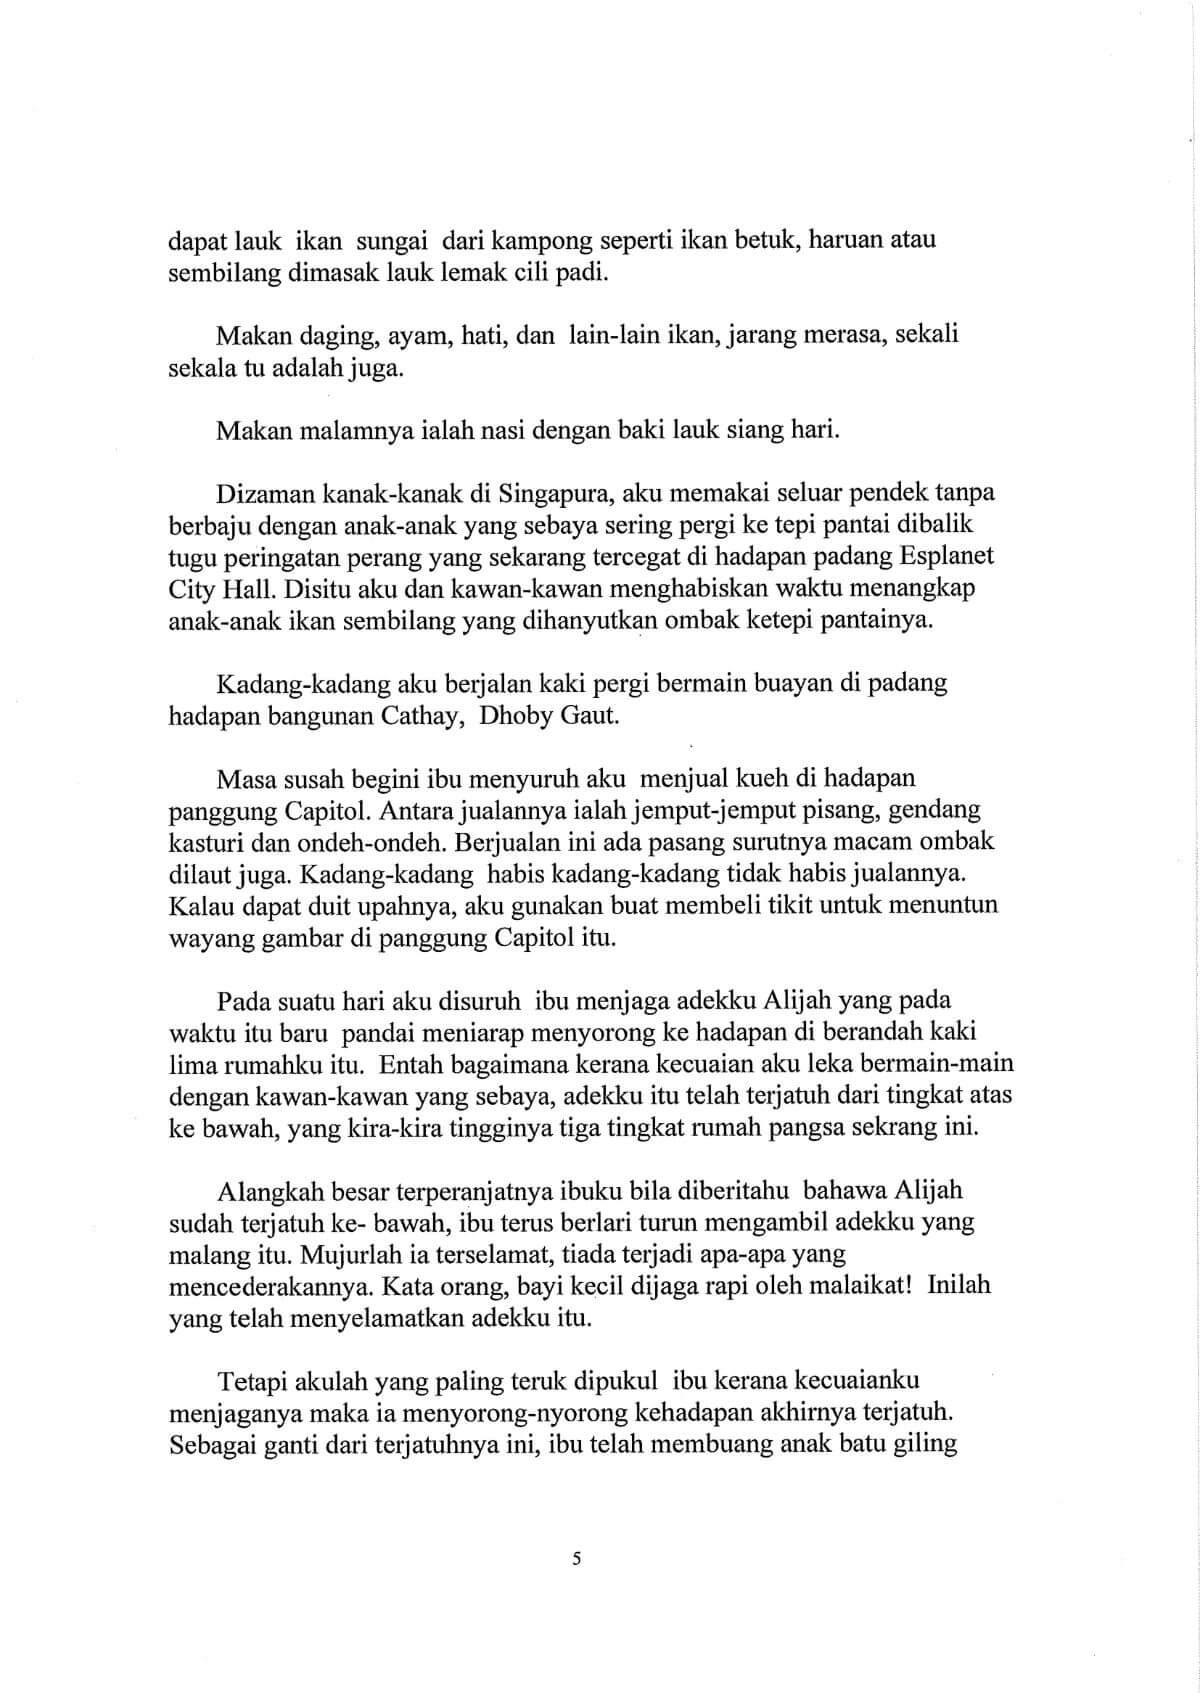 Riwayat hidup pg 5